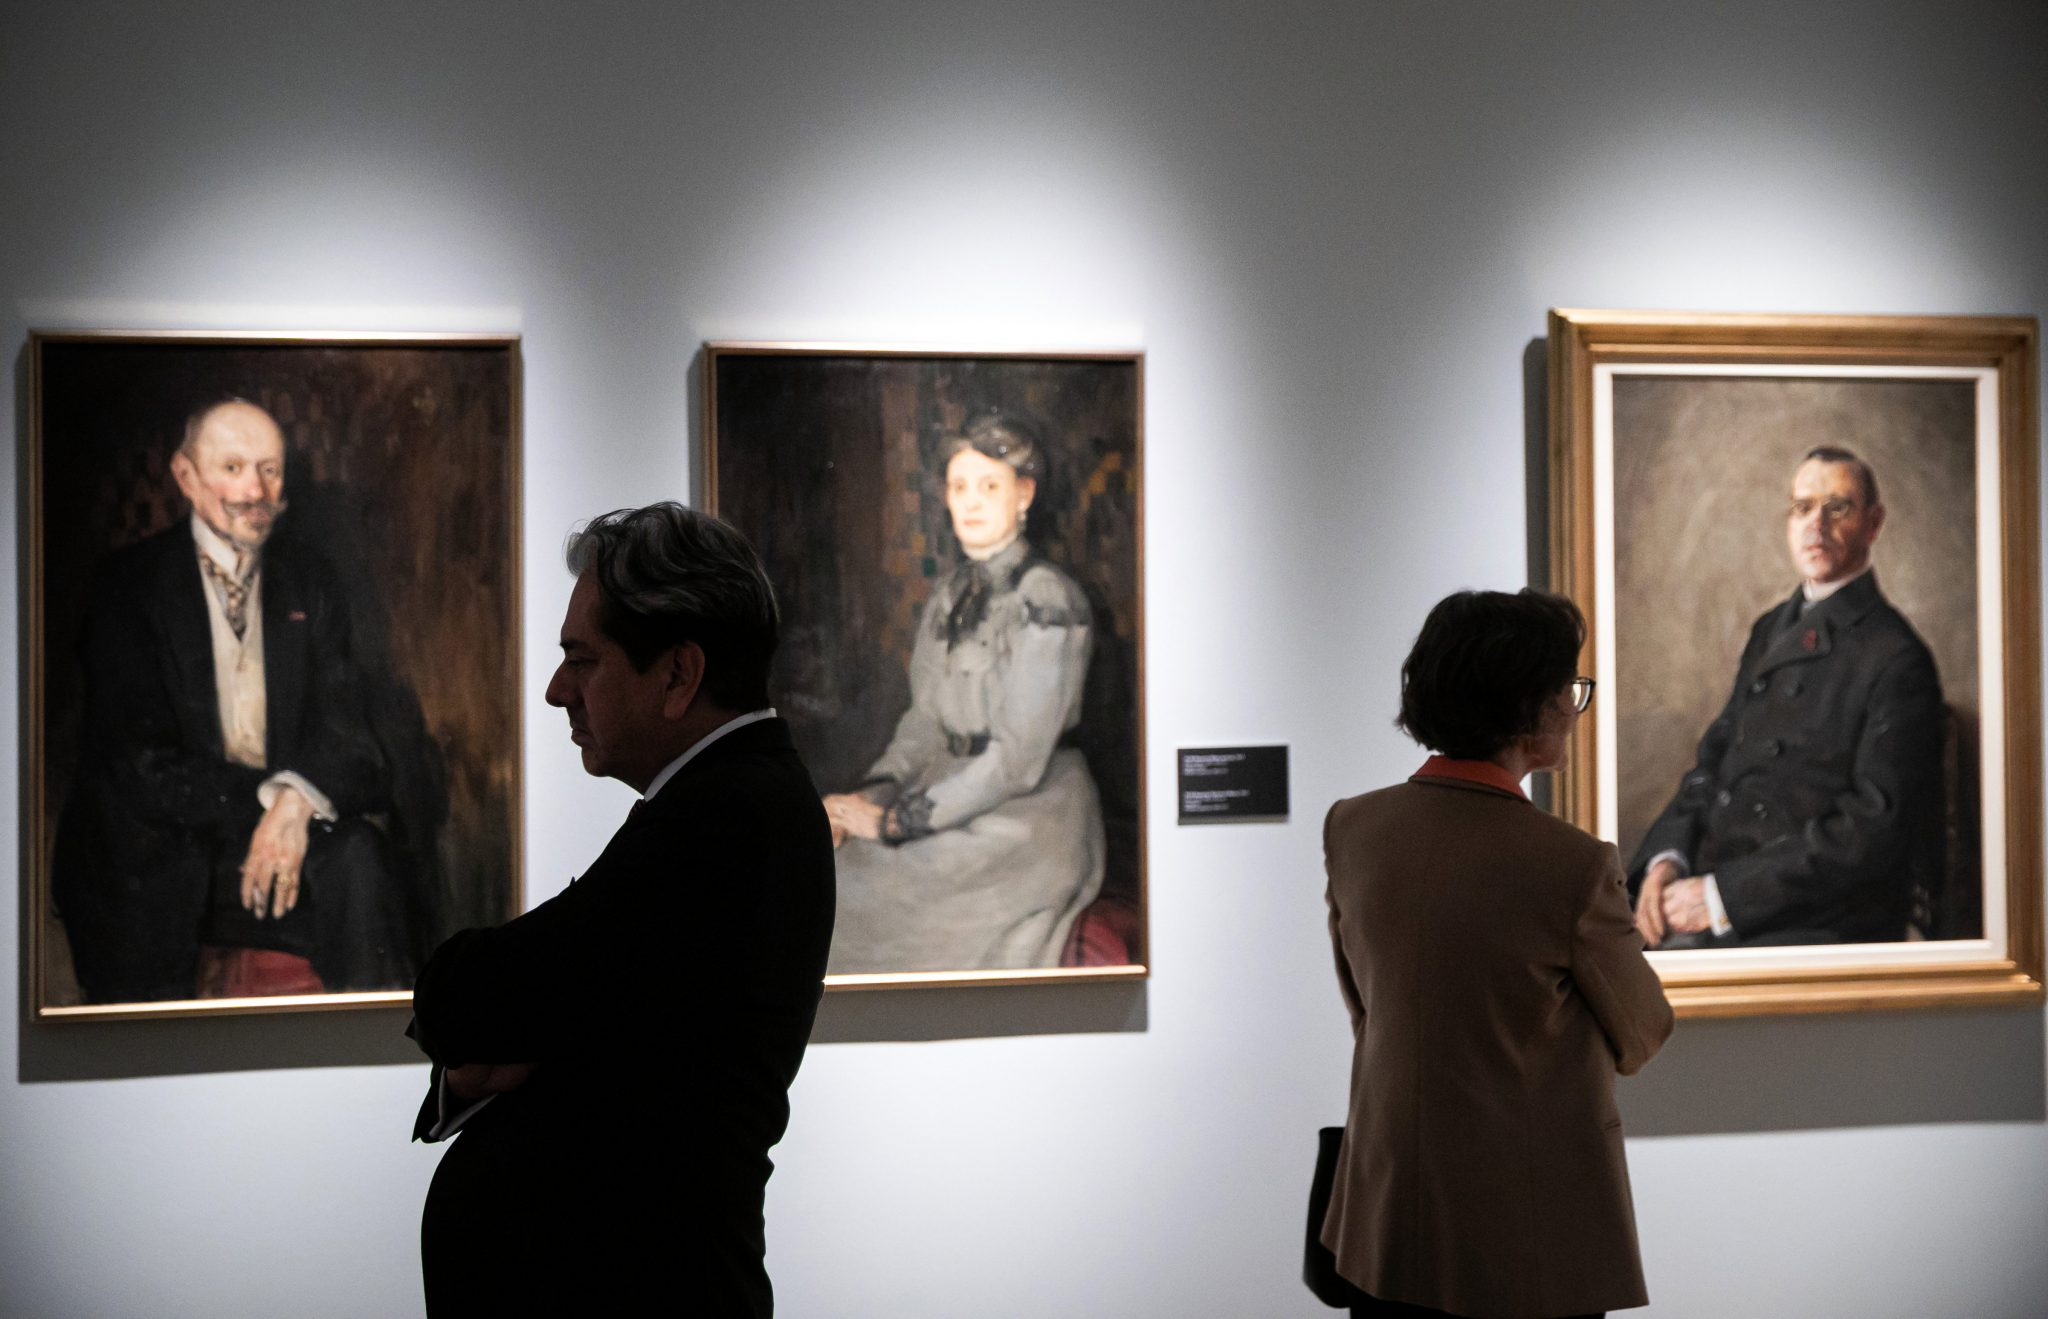 Kraljevic Exhibition Opens in Várkert Bazár post's picture